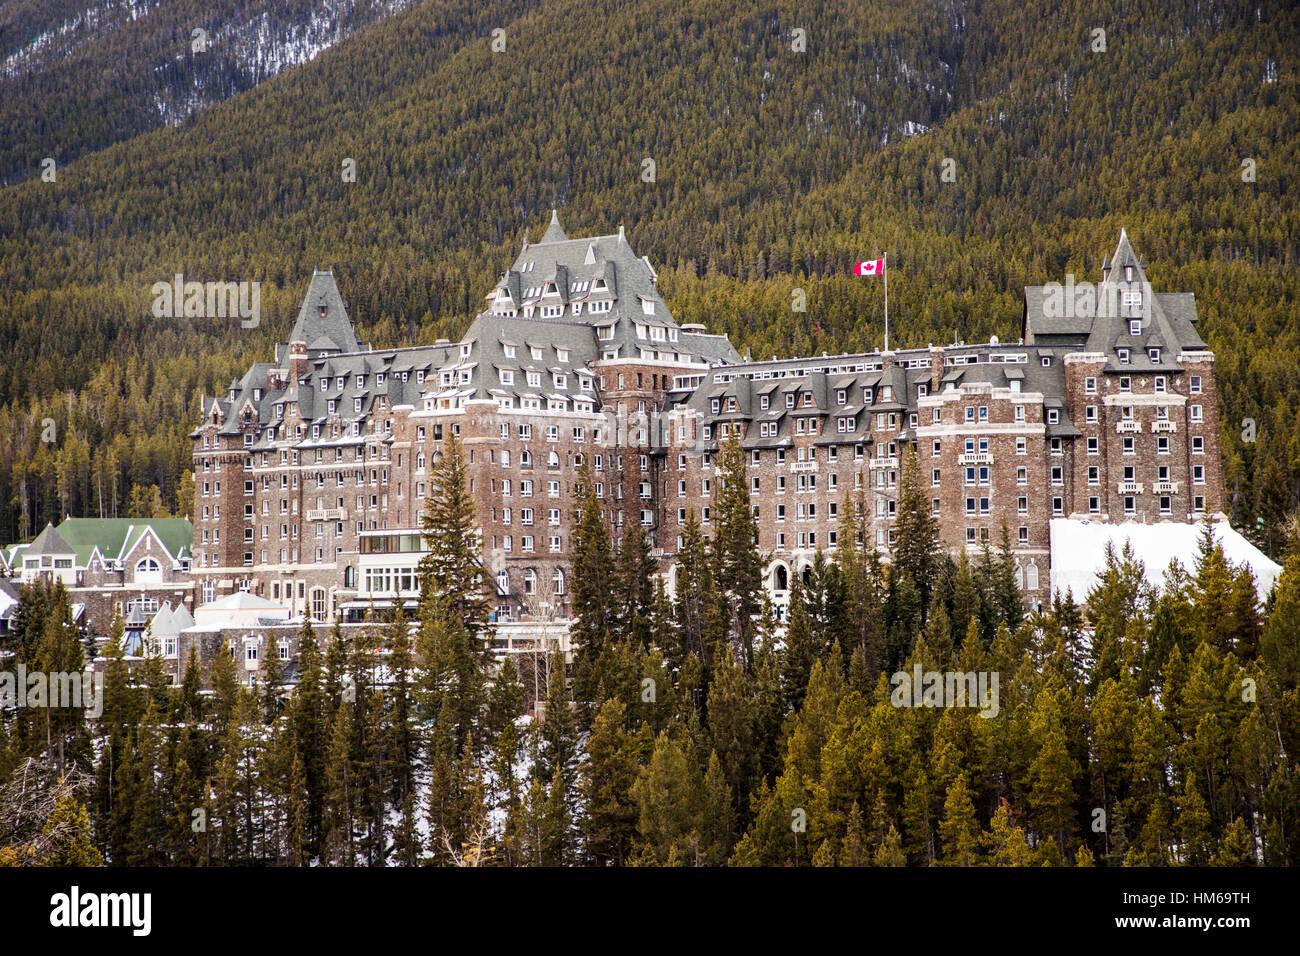 Historic Fairmont Banff Springs hotel; c 1888; Banff; Alberta; Canada 'Castle in the Rockies' - Stock Image